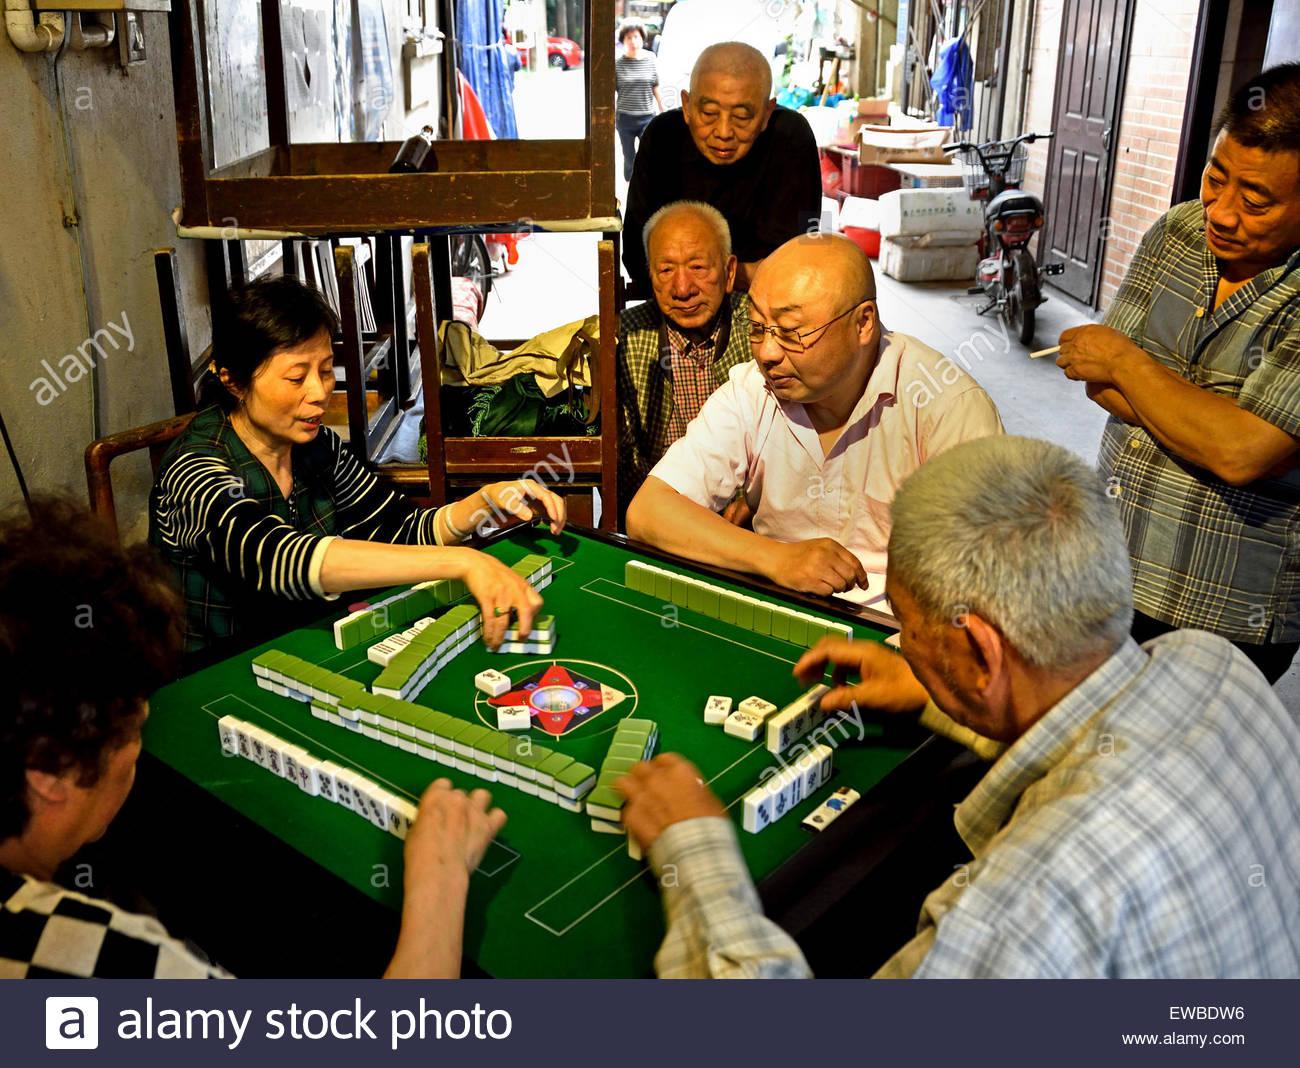 um-jogo-de-mahjong-shanghai-gamble-gambl